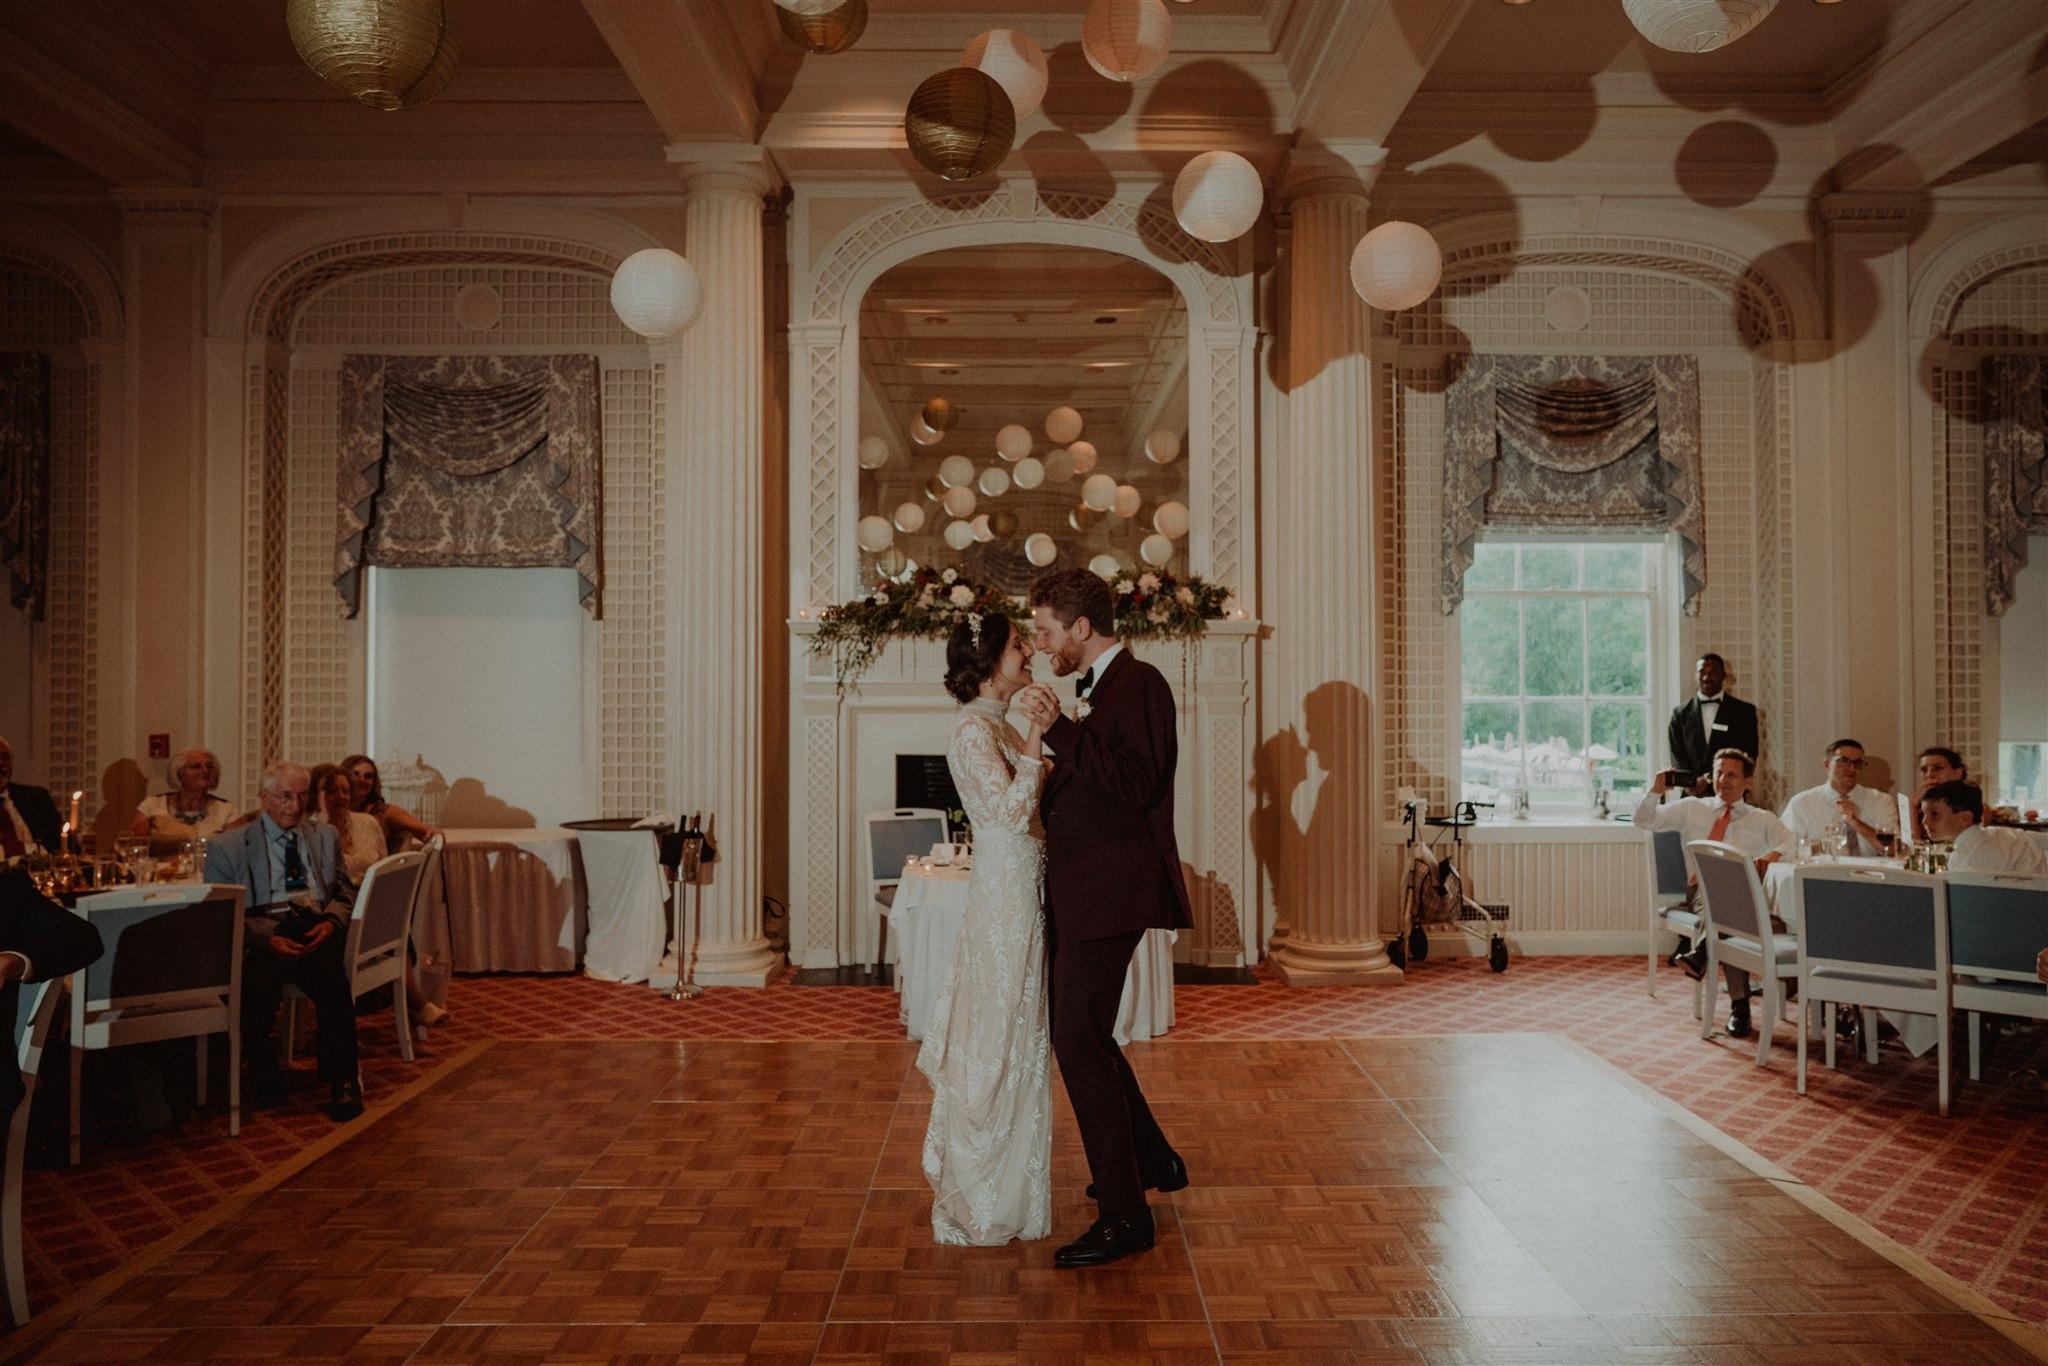 Chellise_Michael_Photography_Hudson_Valley_Wedding_Photographer_Otesaga_Hotel-6003.jpg